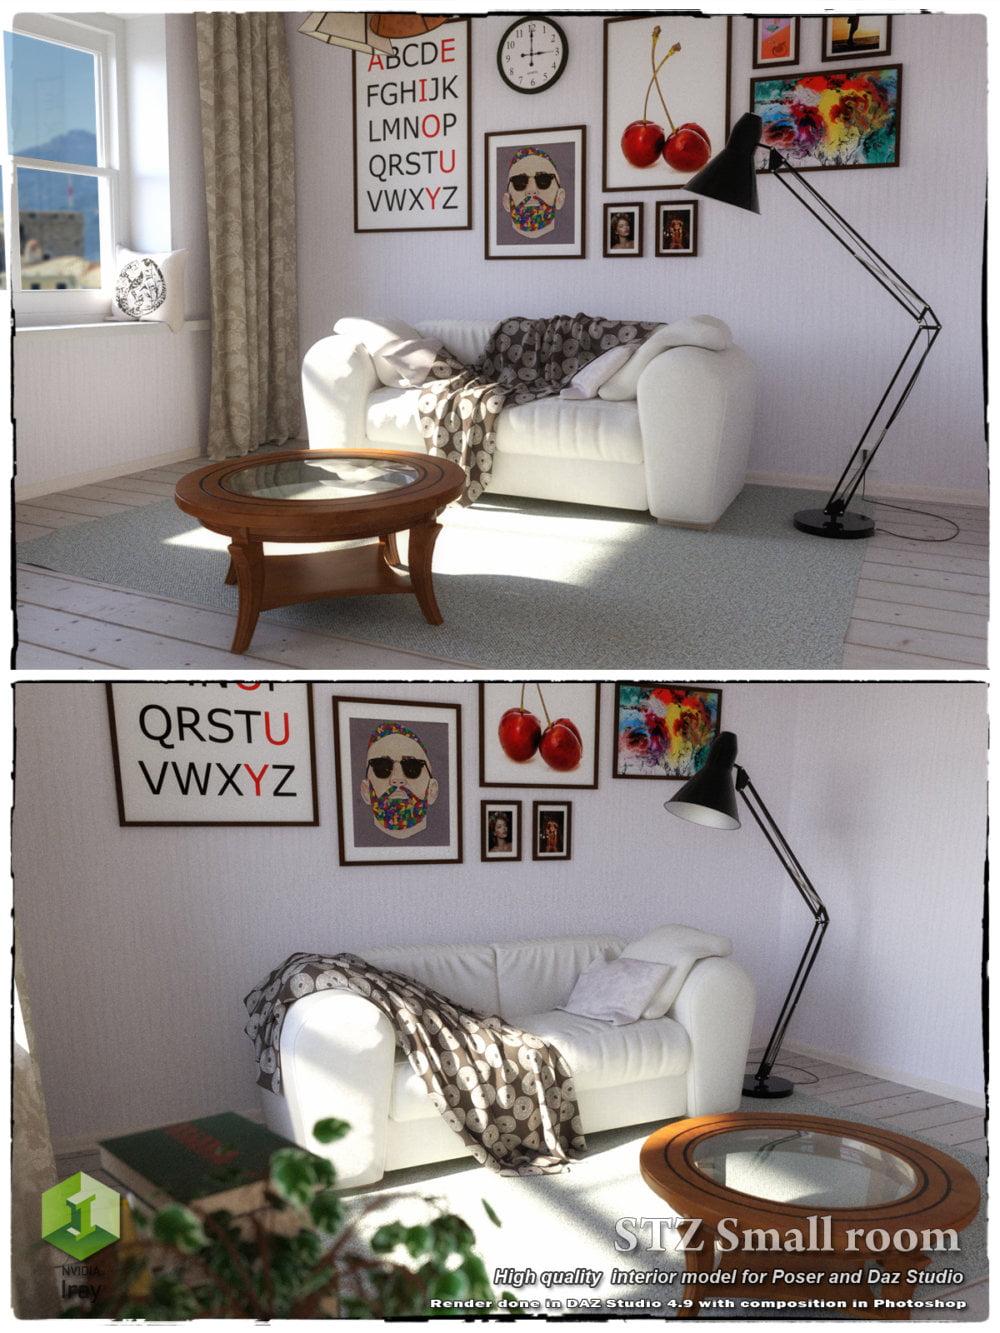 STZ Small room